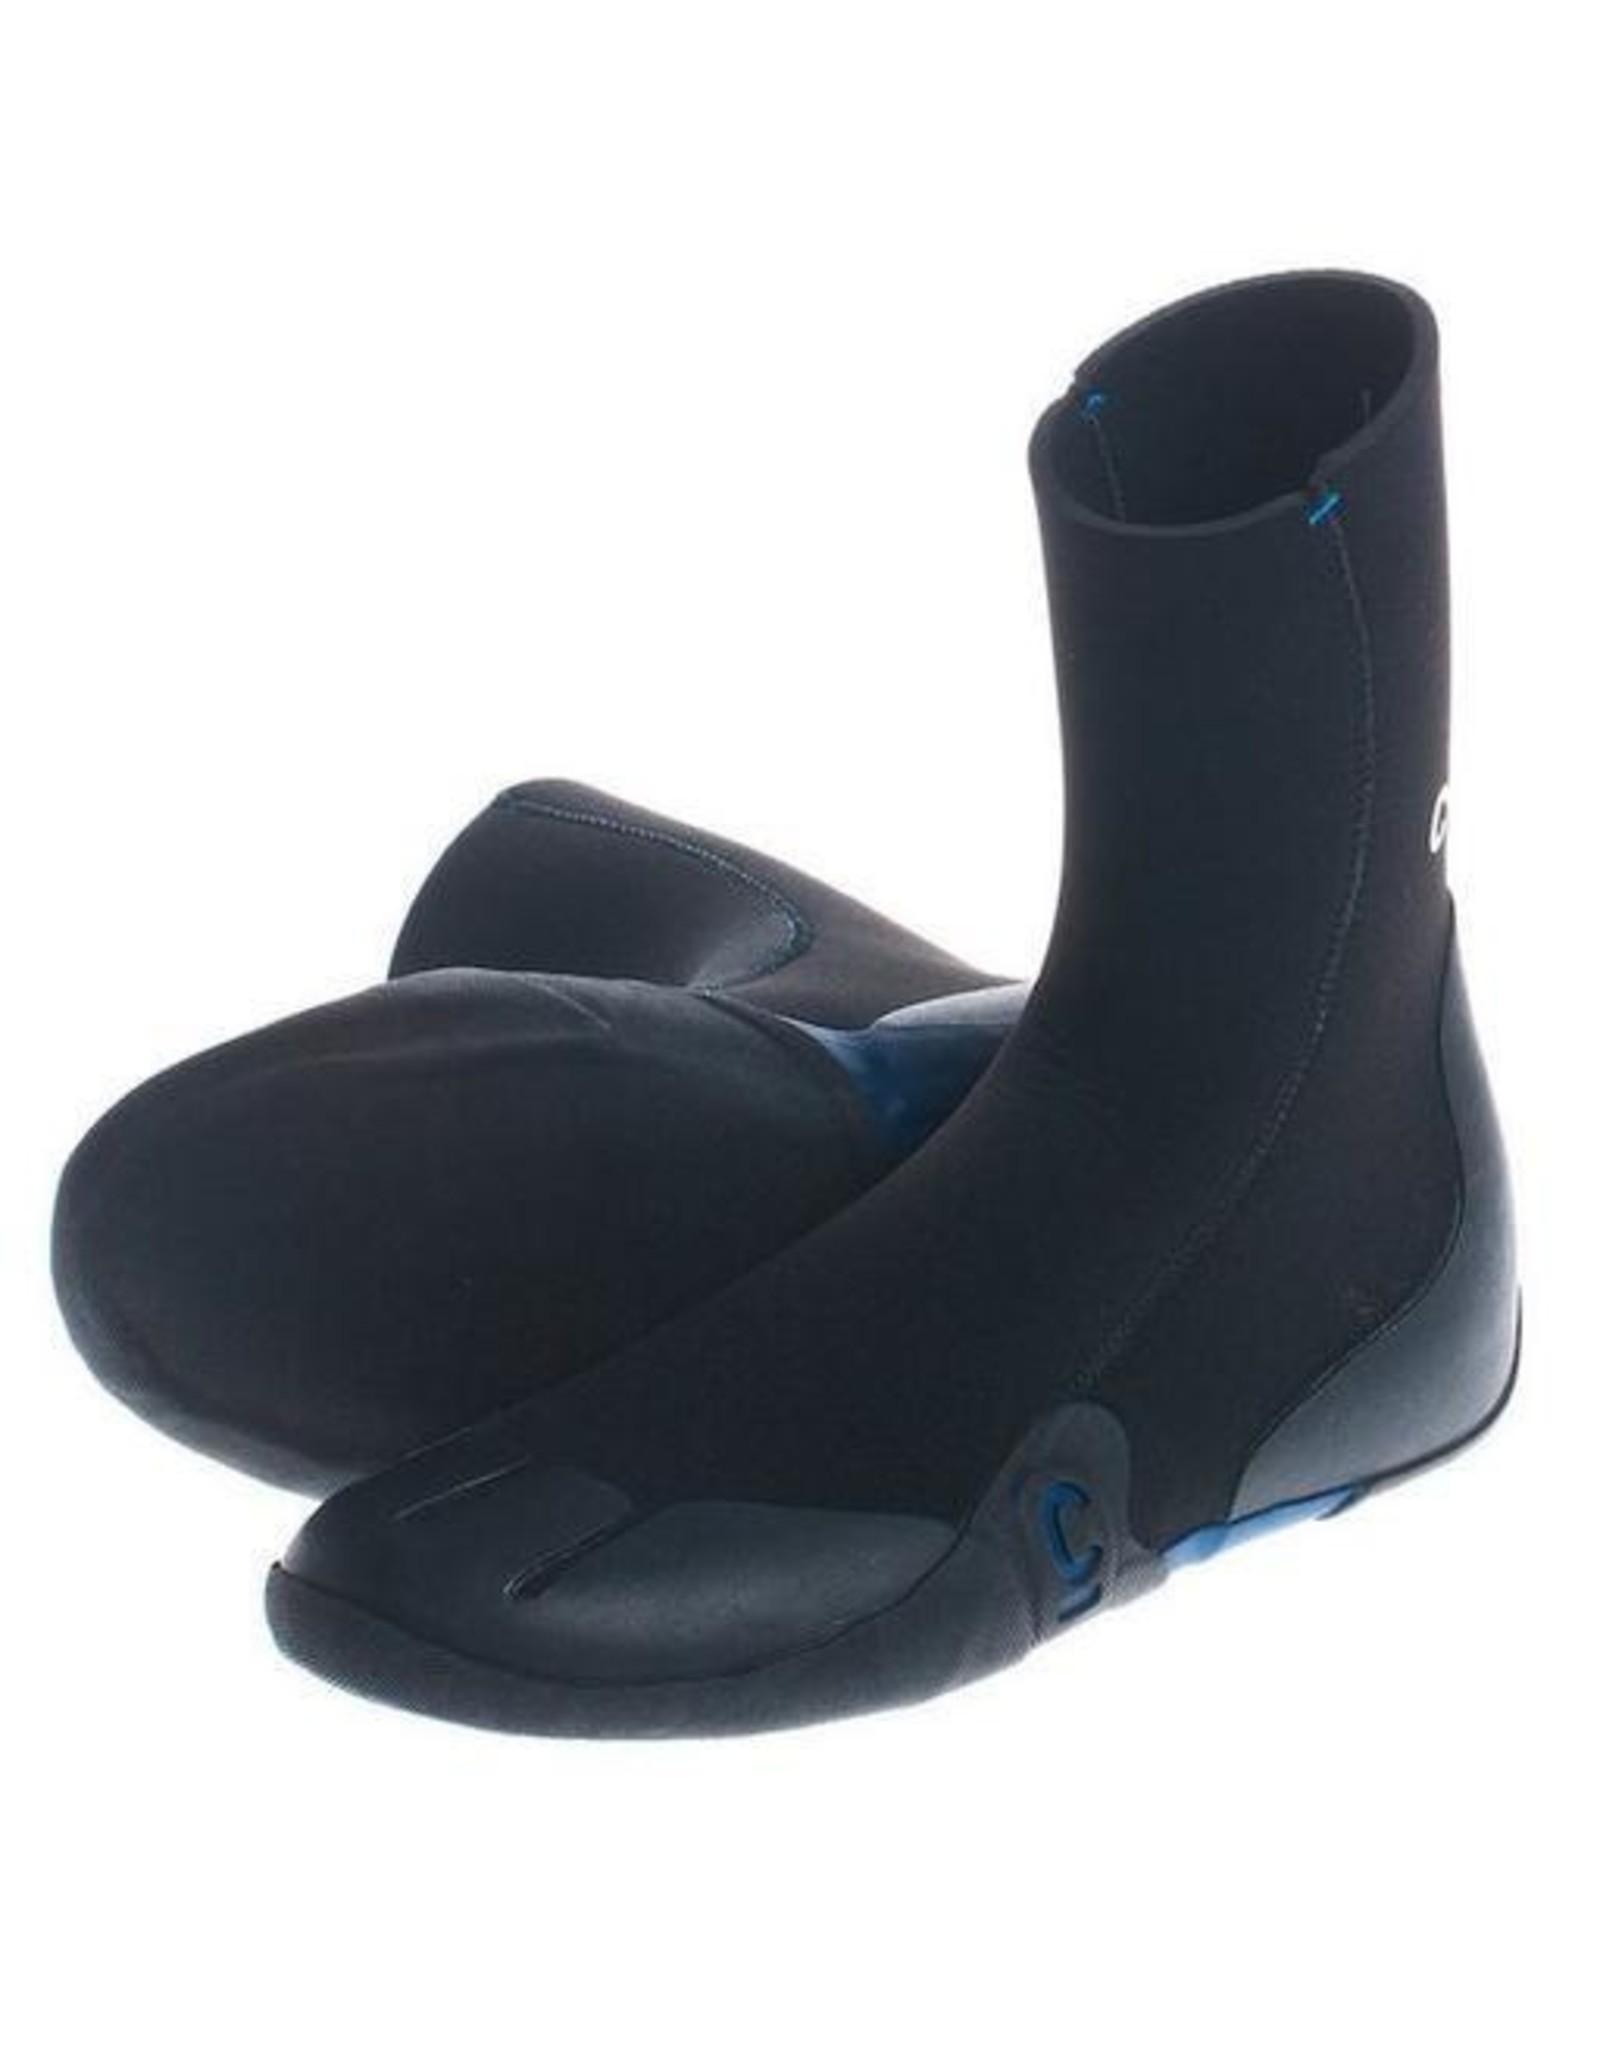 C-Skins C-Skins - 5mm - Legend - US9/42 - Round Toe Boot